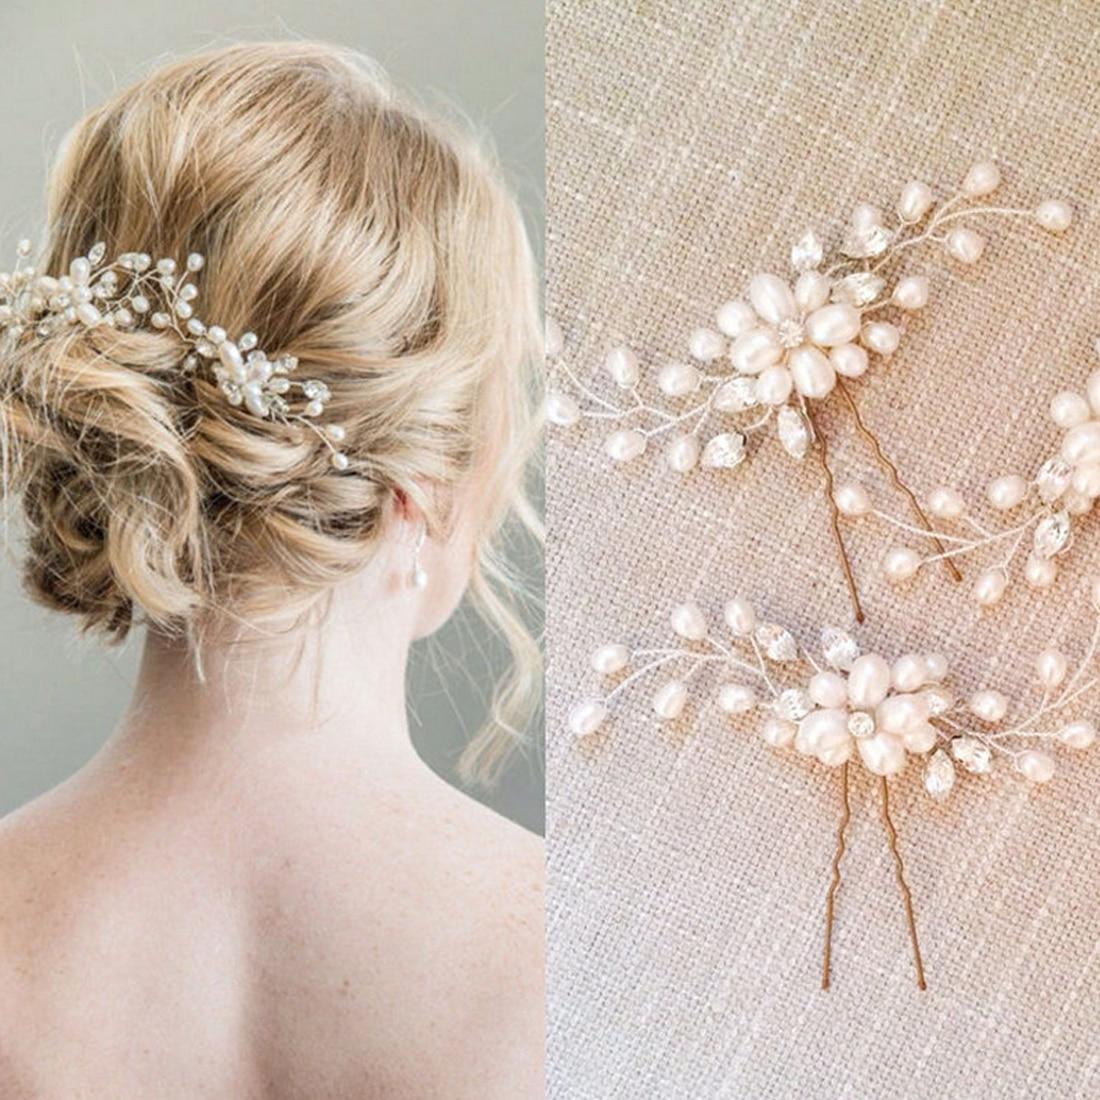 Crystal Hair Pin Vintage Wedding Bridal Pearl Flower  Hair Clip U-shaped Clips Pins Bridesmaid Gift Hairdressing Stylist Tool